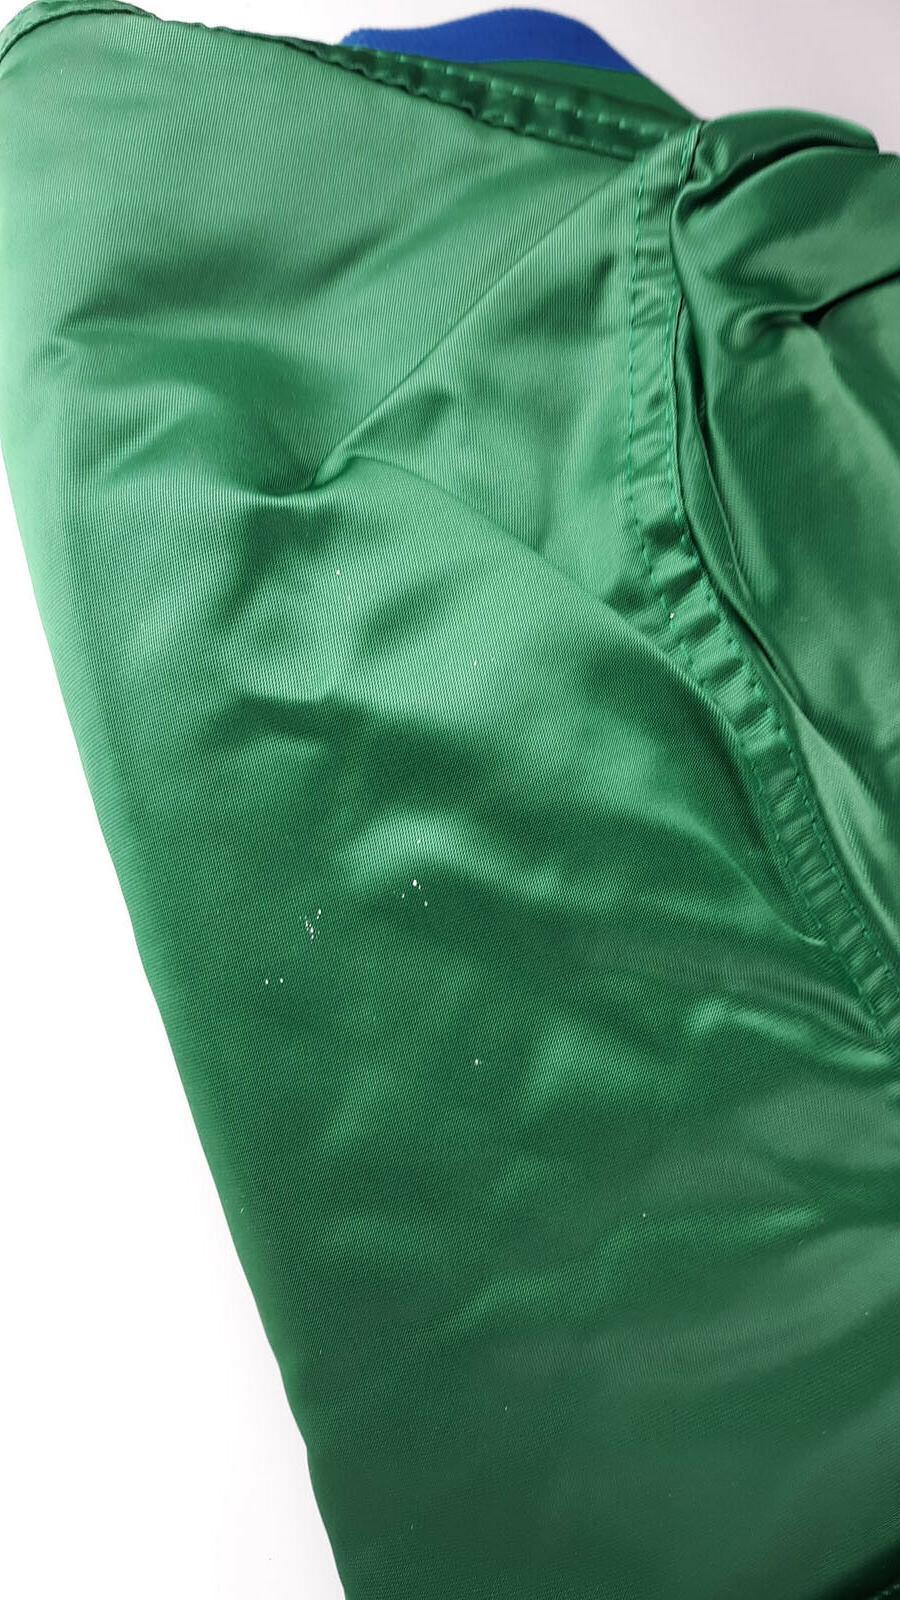 Vintage Satin Starter Jacket NBA Green in Original Bag